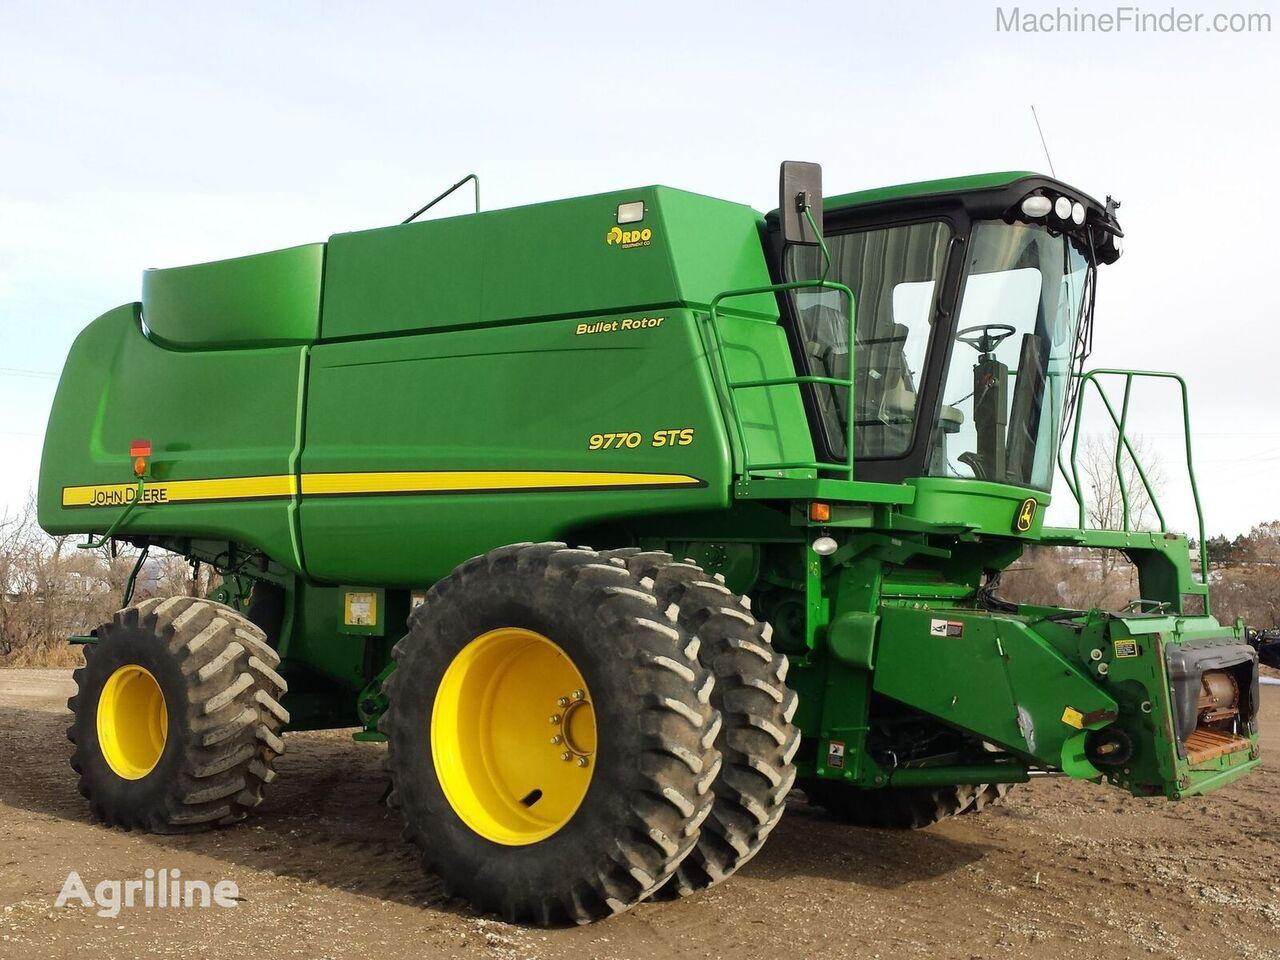 JOHN DEERE 9770 STS grain harvester